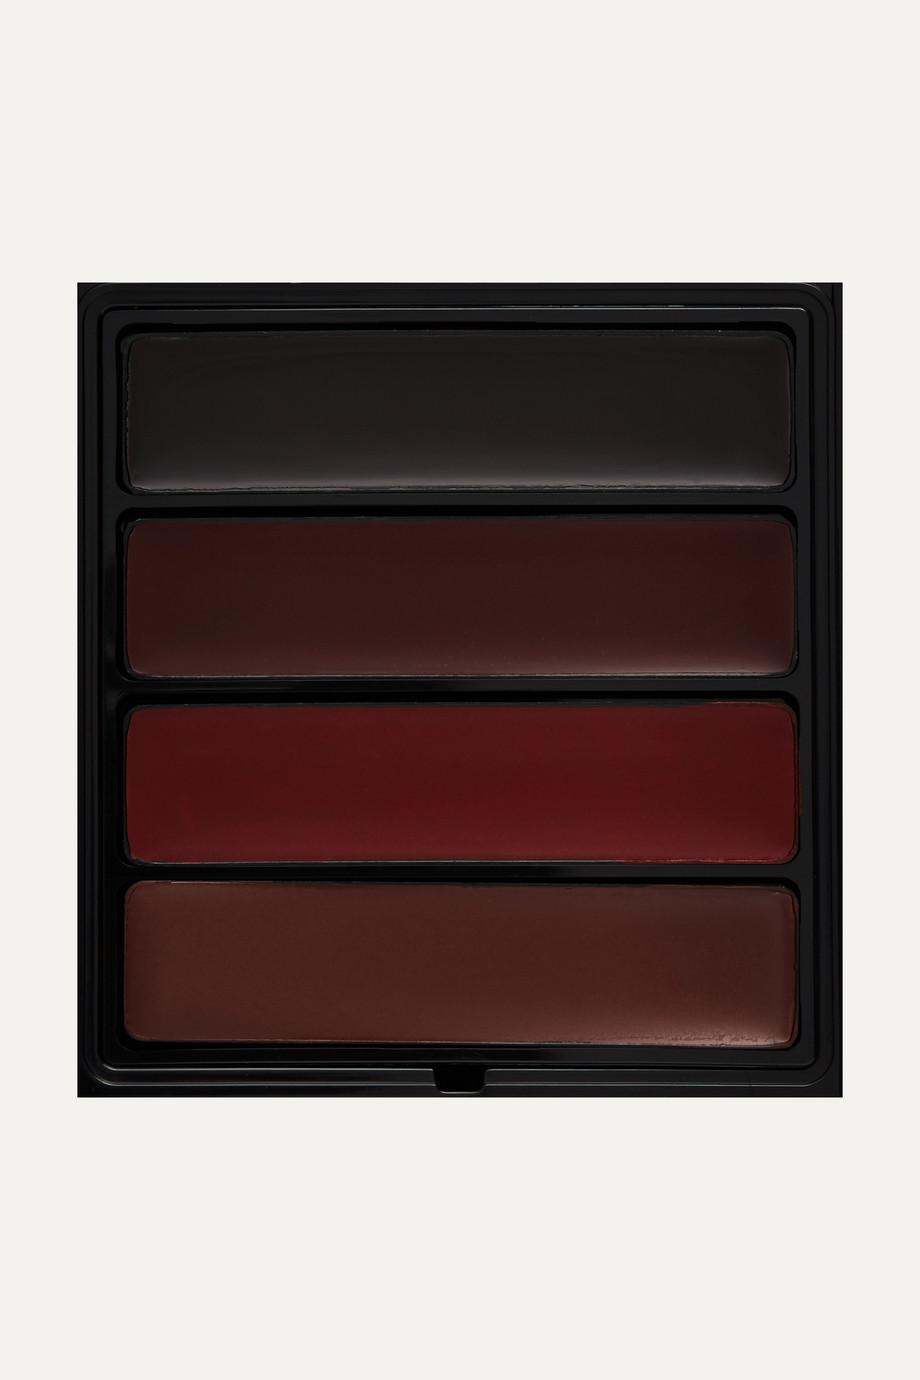 Serge Lutens Lip Palette – 3 – Lippenfarbenpalette